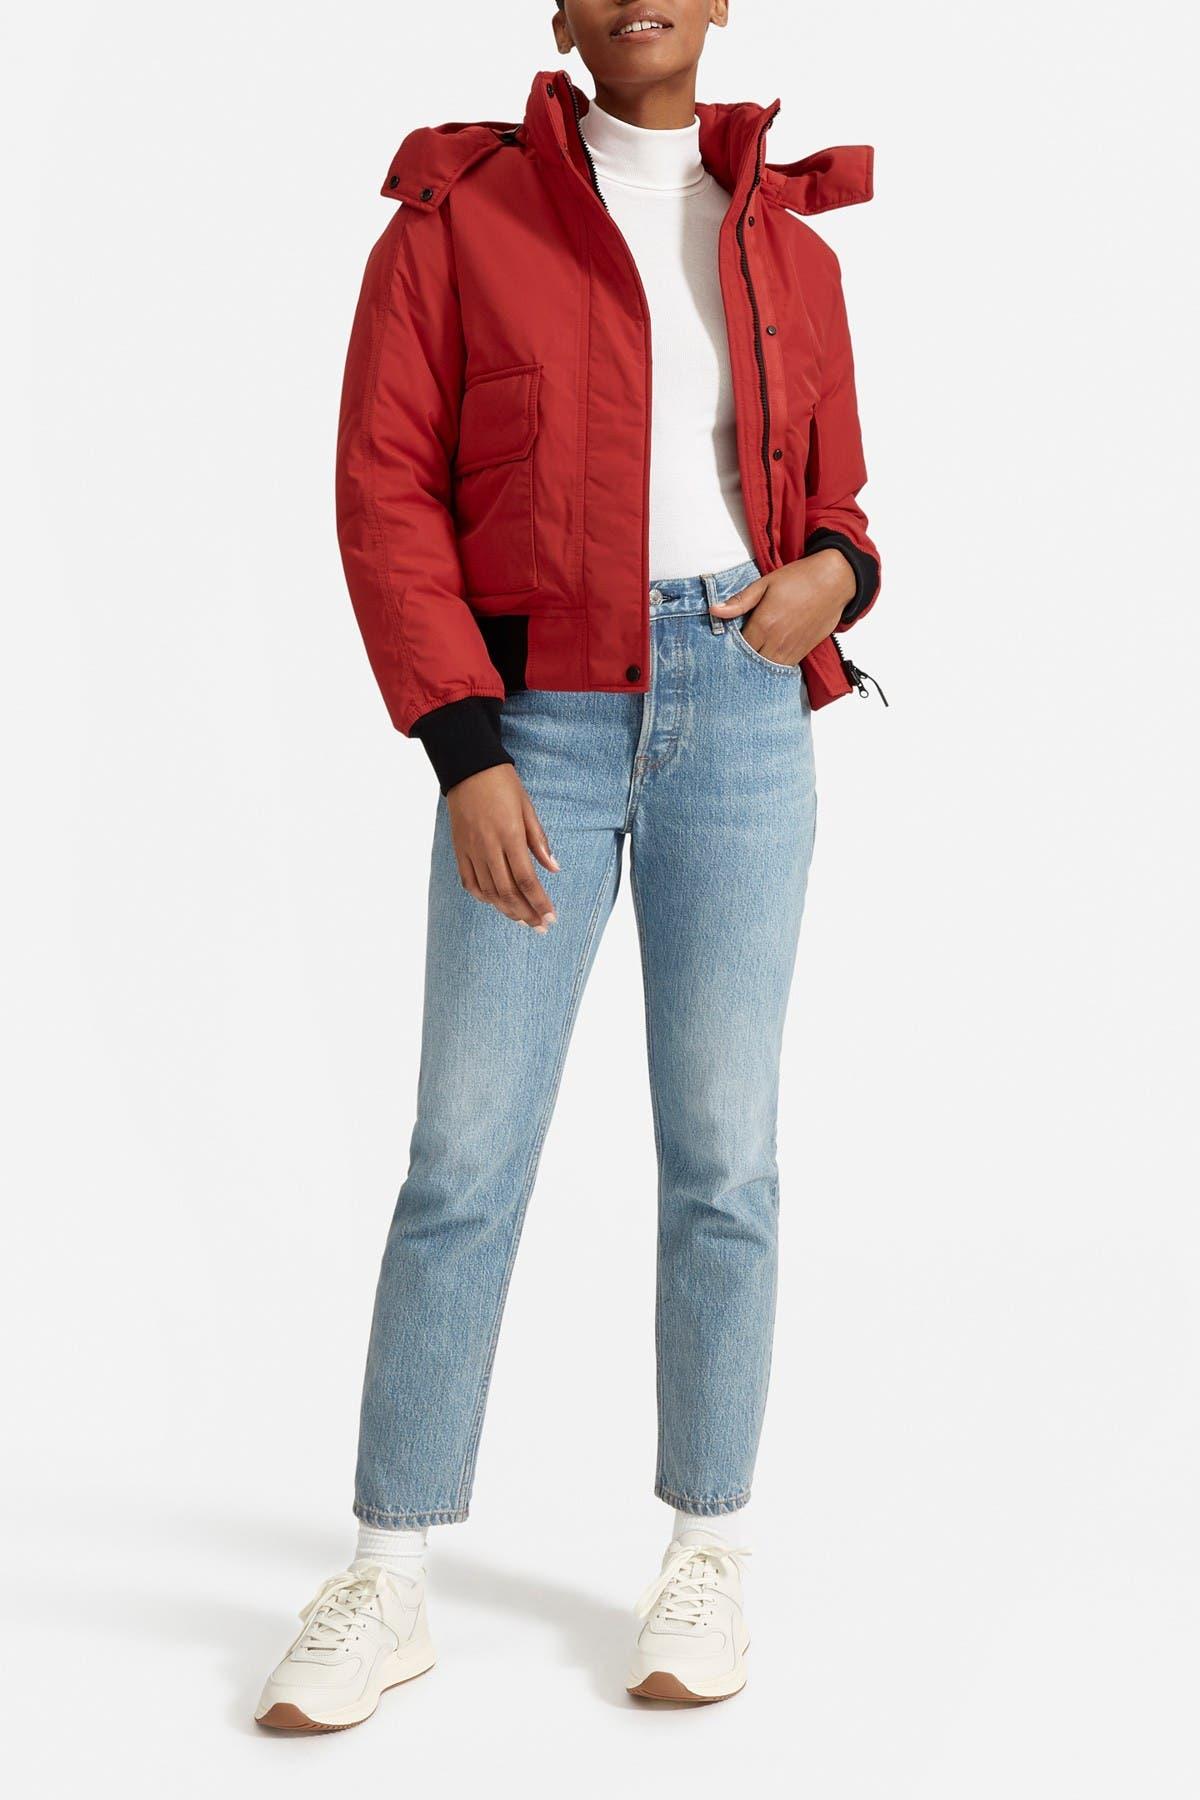 Image of EVERLANE The ReNew Heavyweight Bomber Jacket